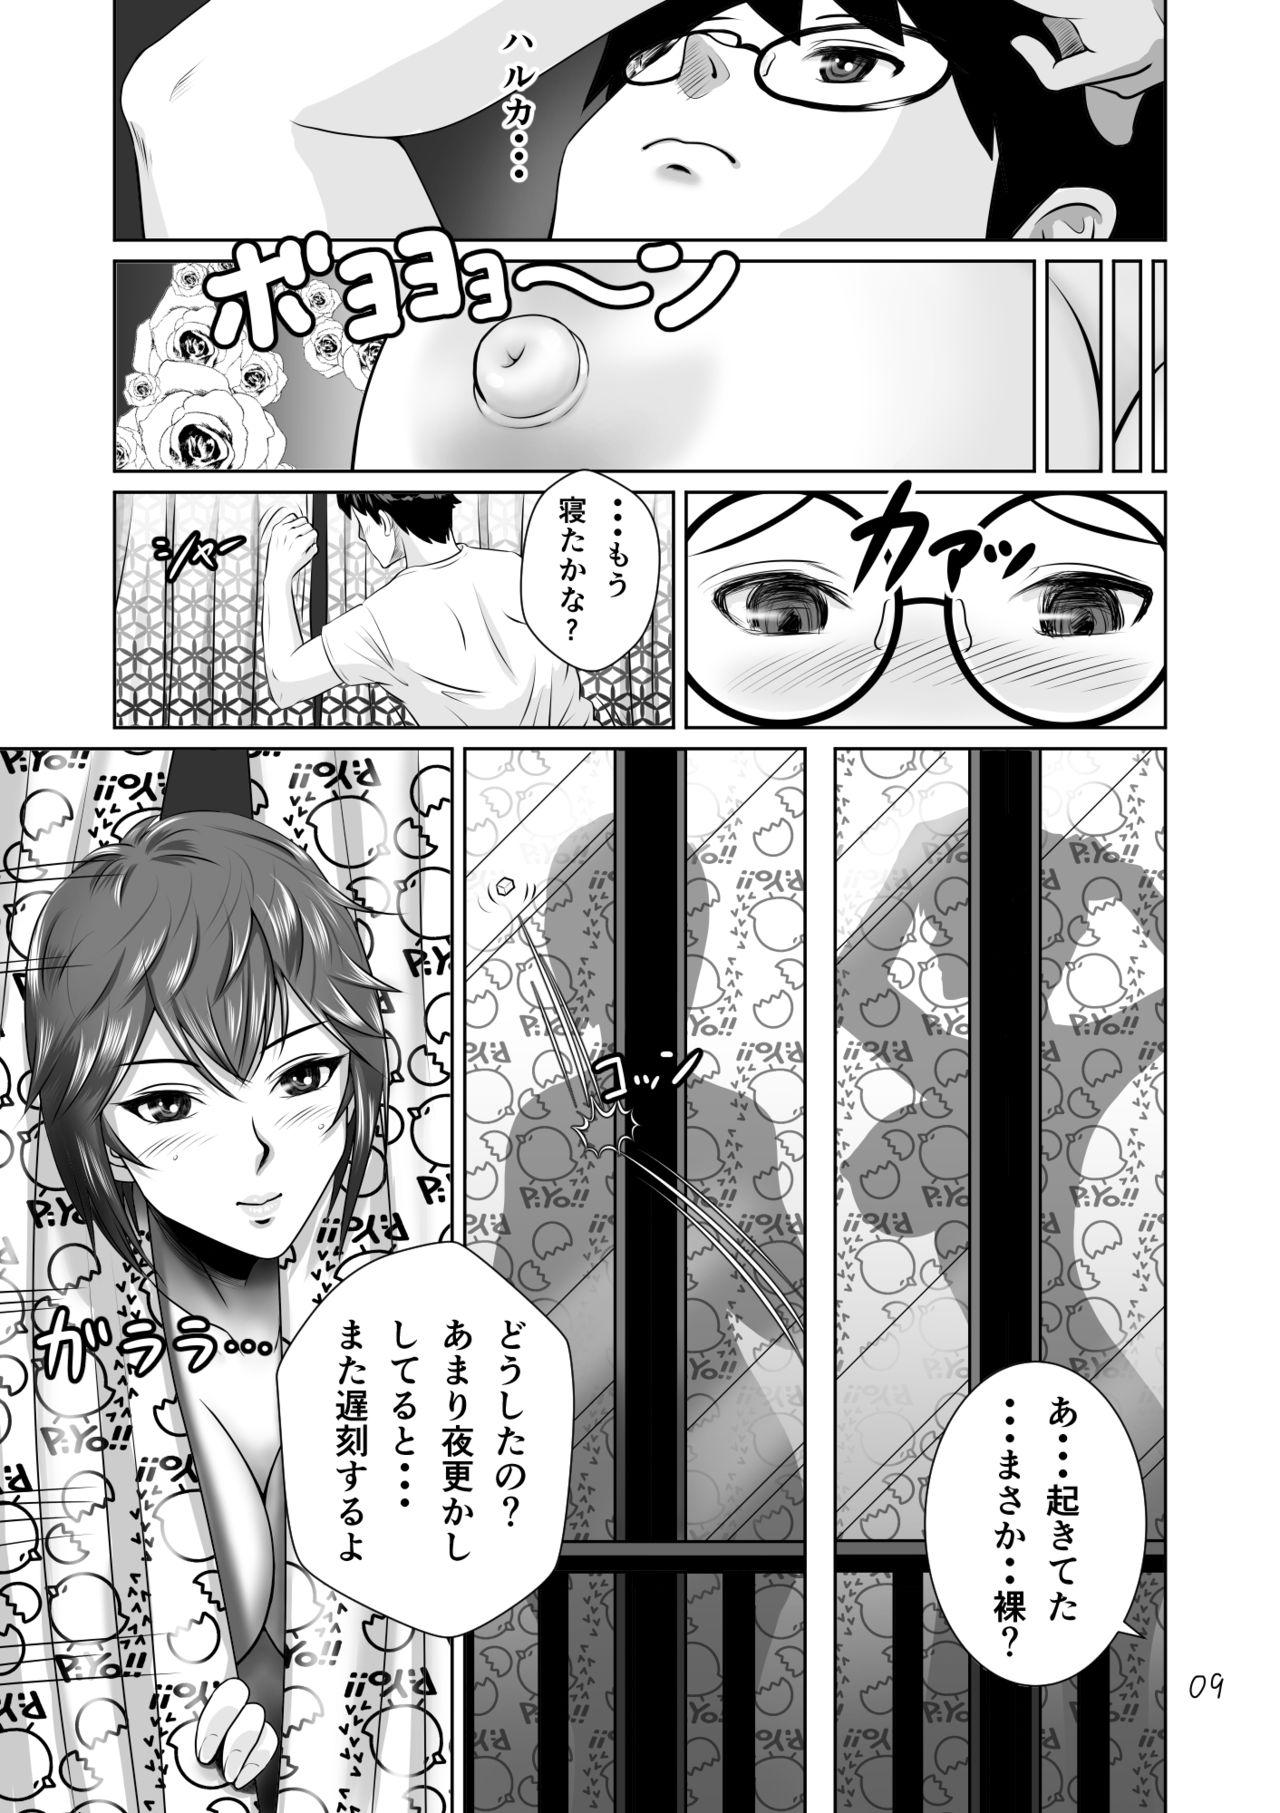 Netorare Osananajimi Haruka-chan Kiki Ippatsu!! 9